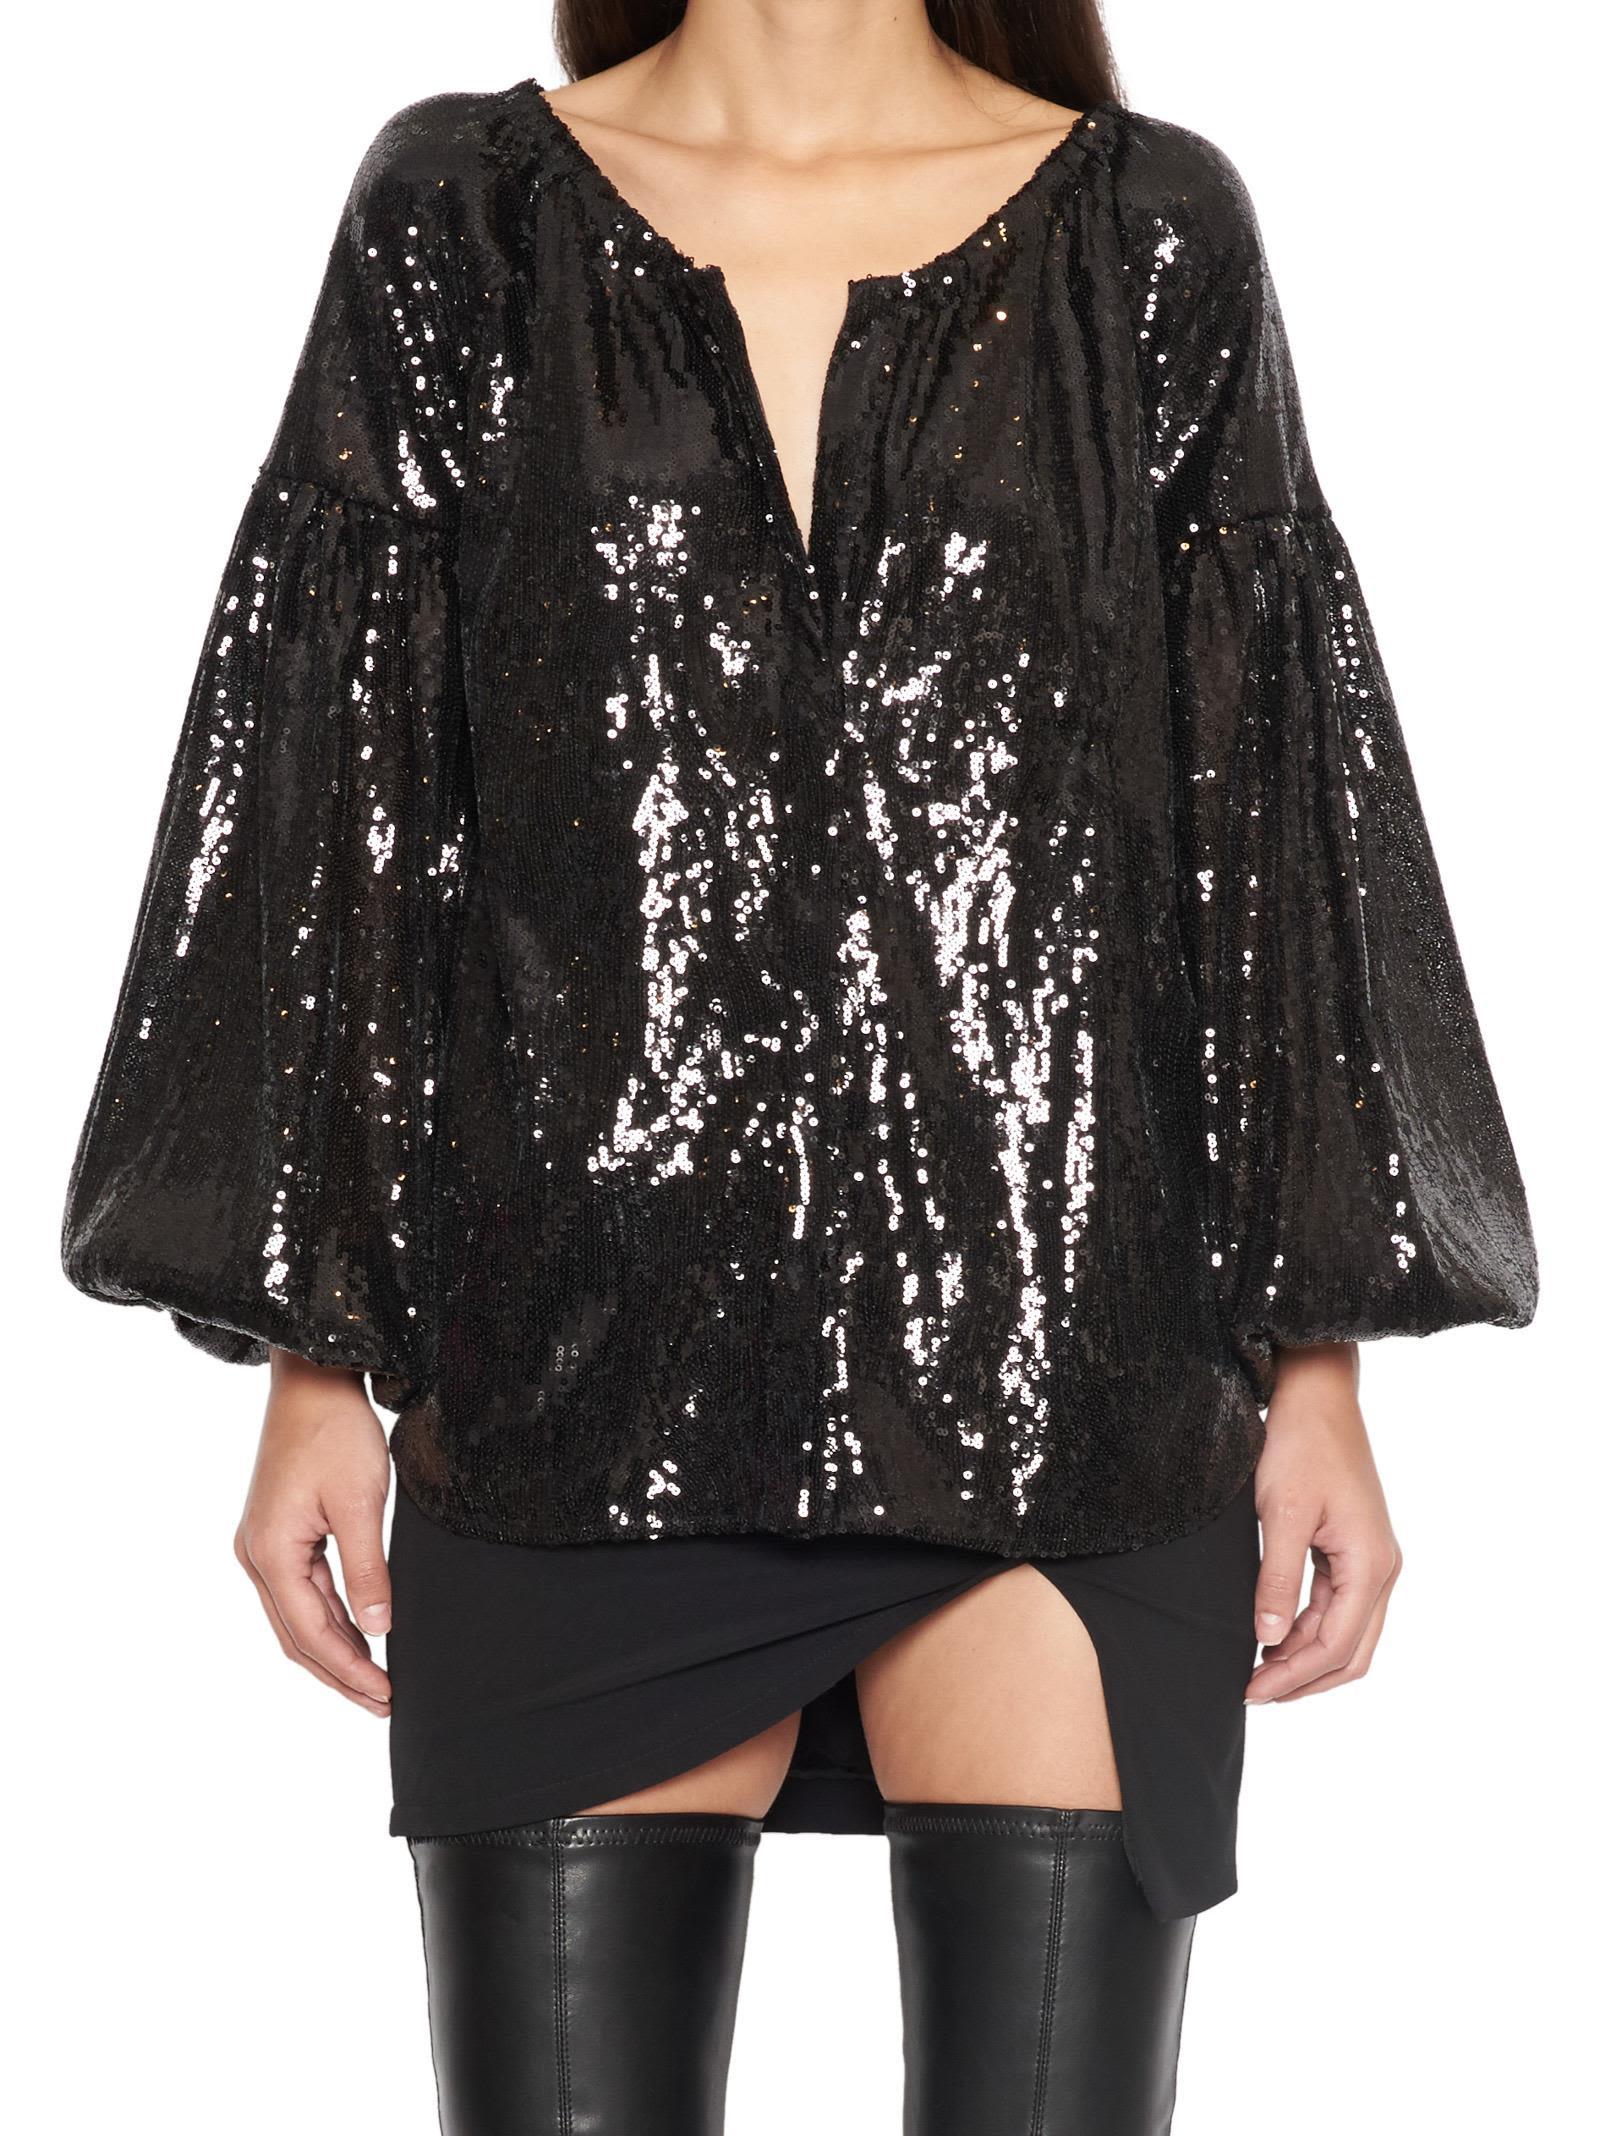 WANDERING Wandering Sequinned Oversized Blouse in Black